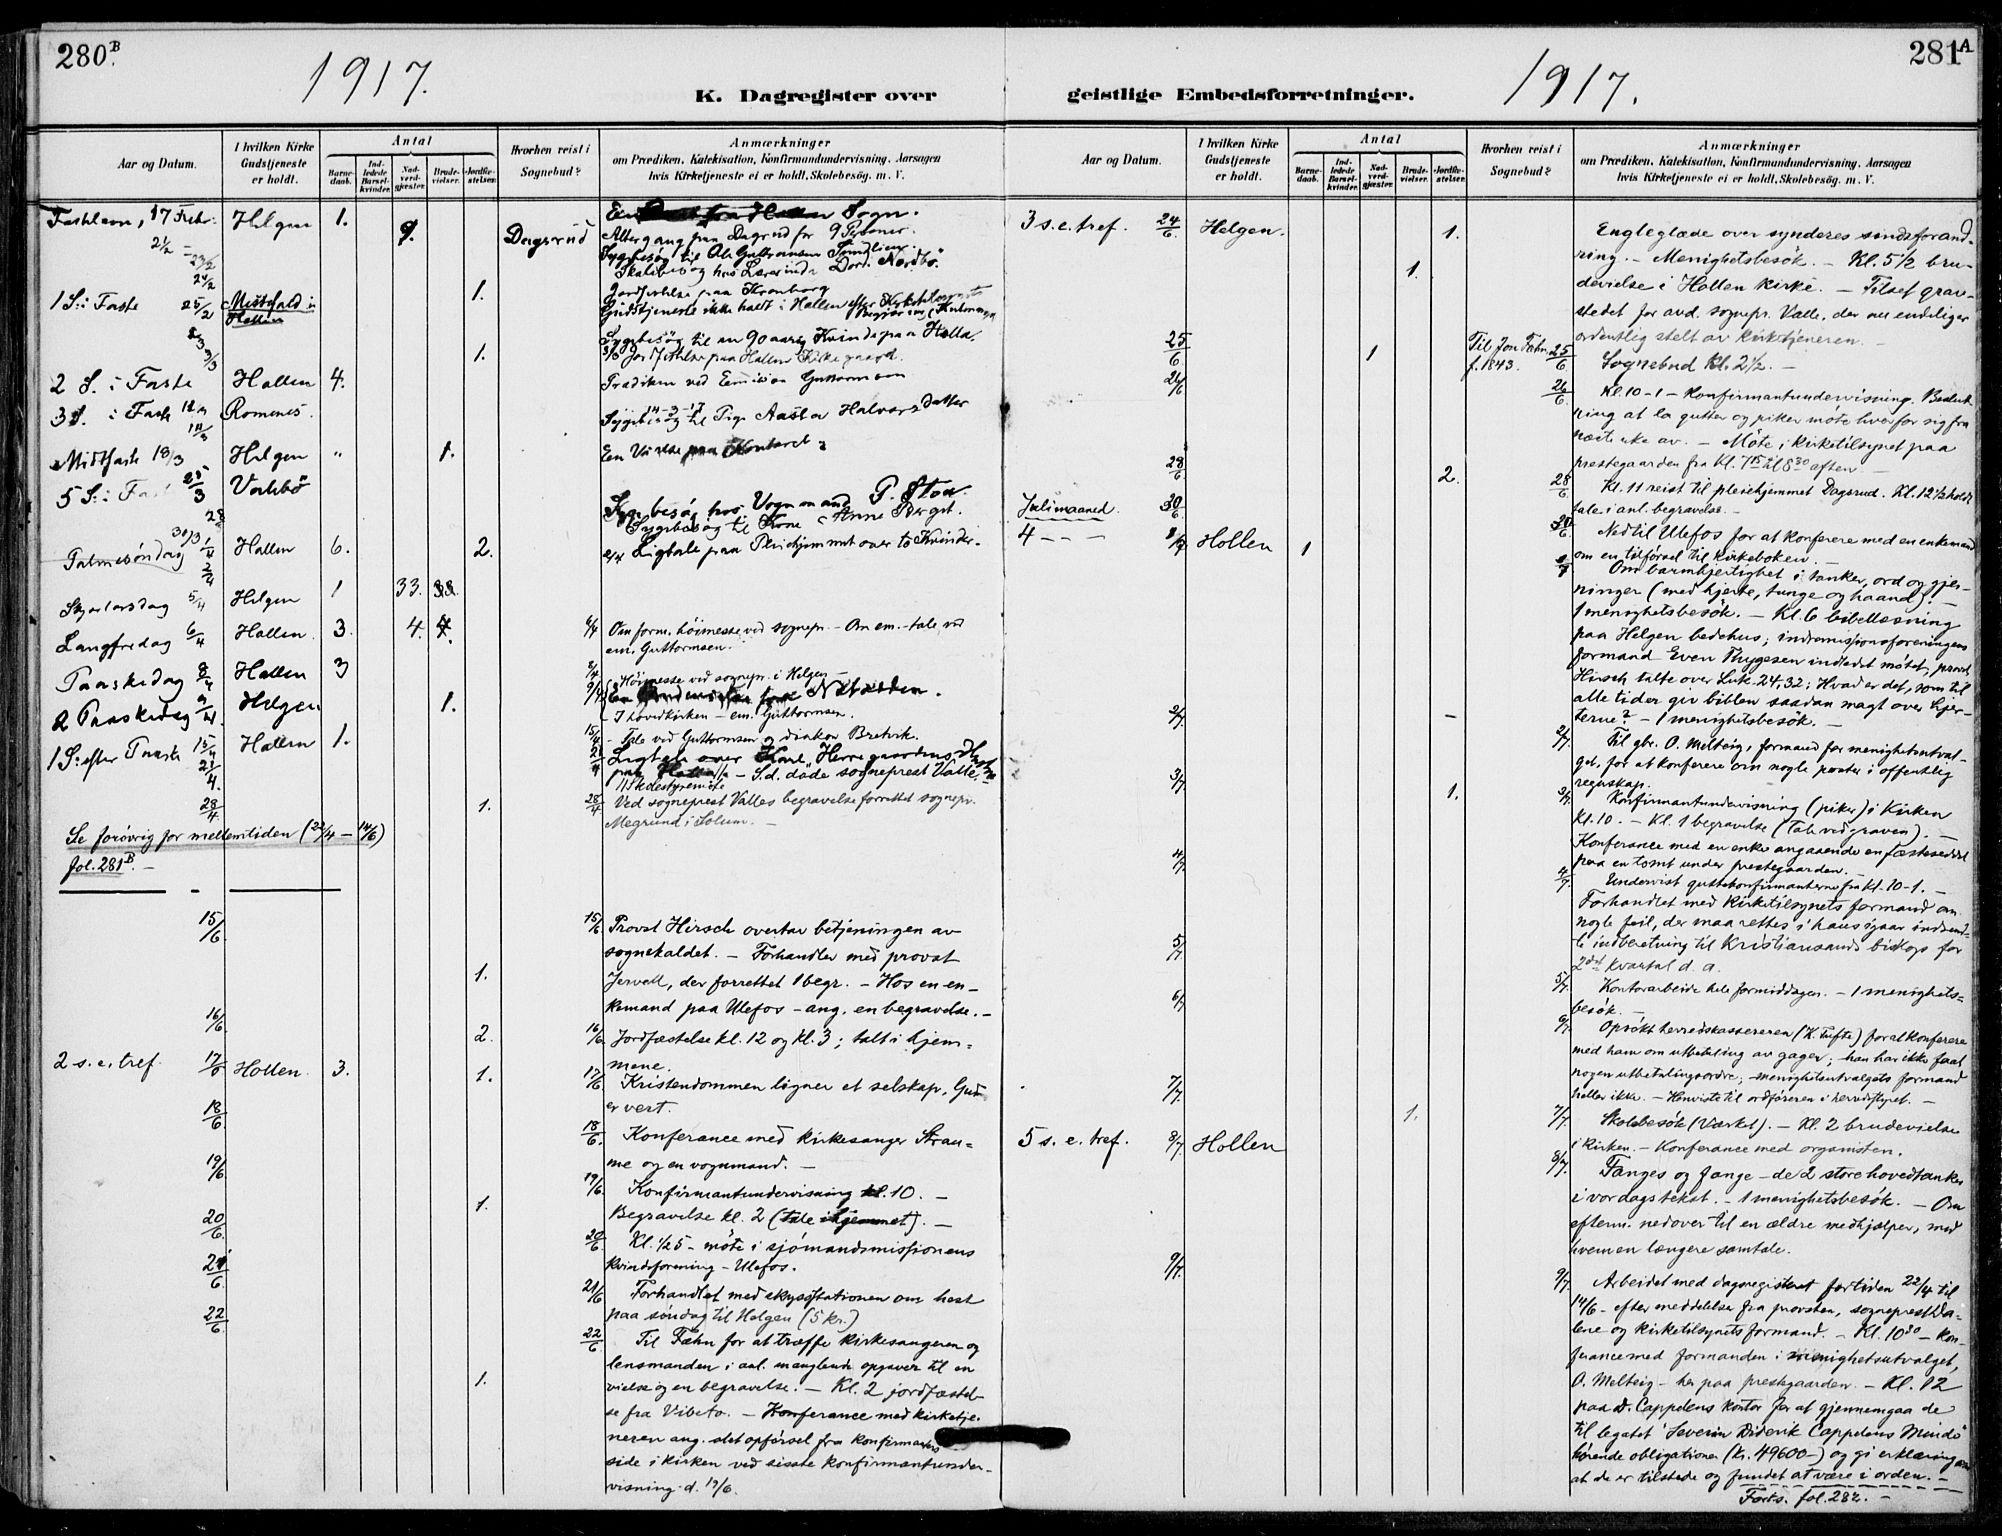 SAKO, Holla kirkebøker, F/Fa/L0012: Ministerialbok nr. 12, 1907-1923, s. 281